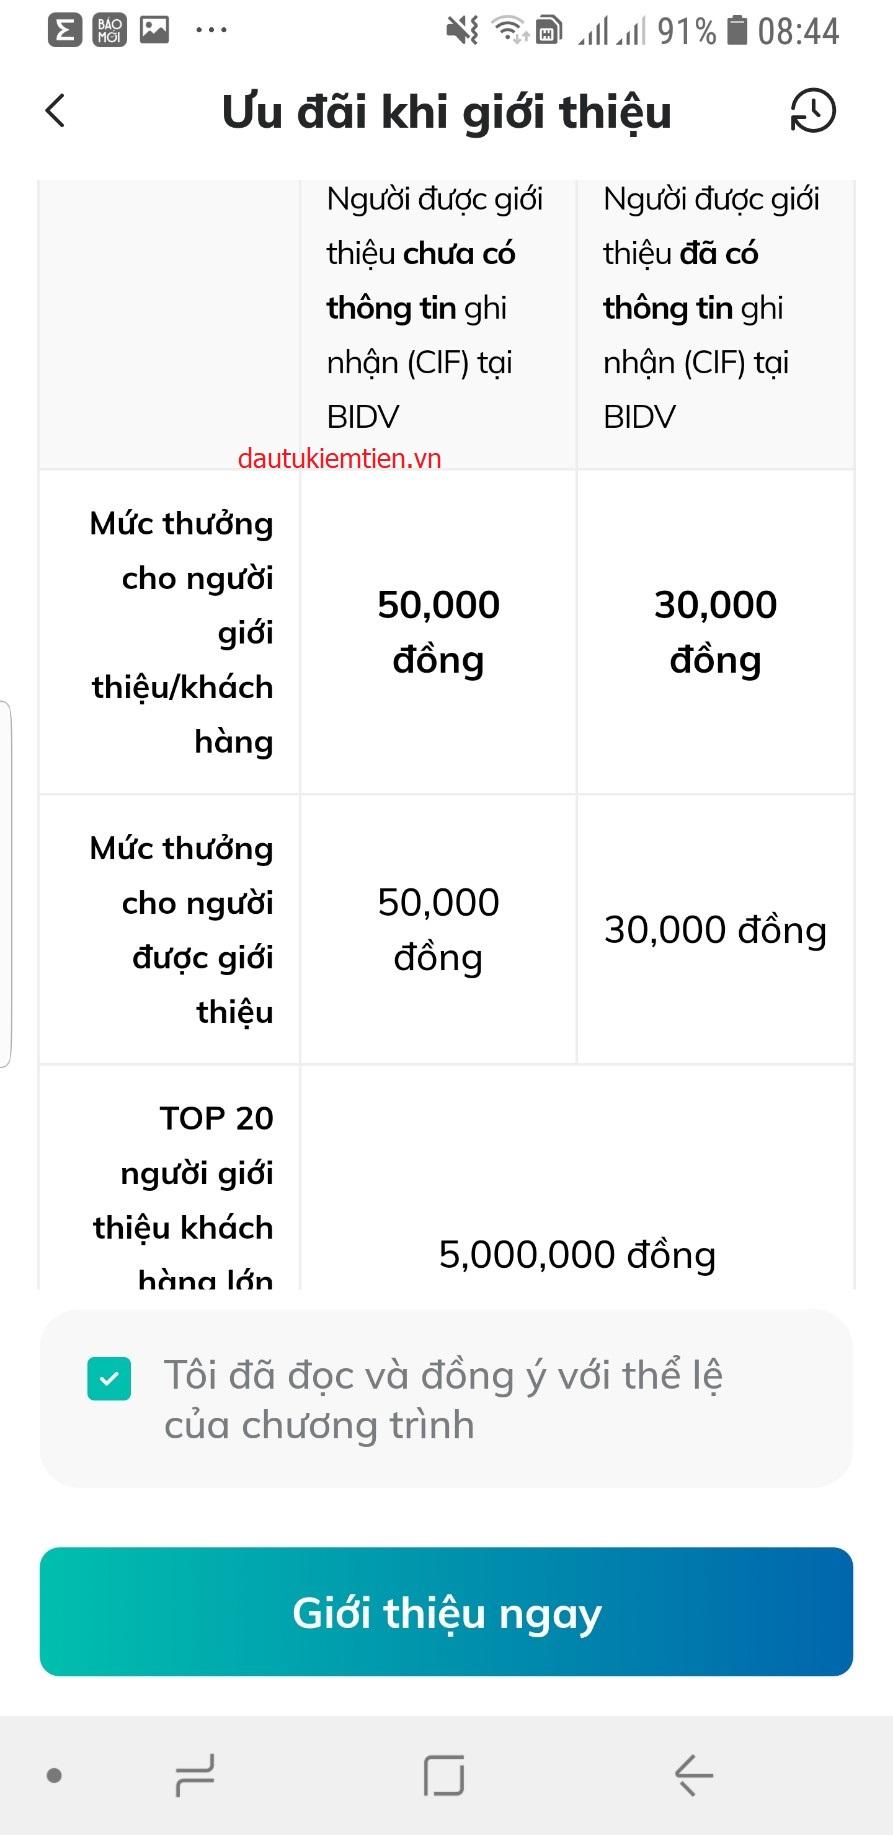 chia se nhan thuong BIDV